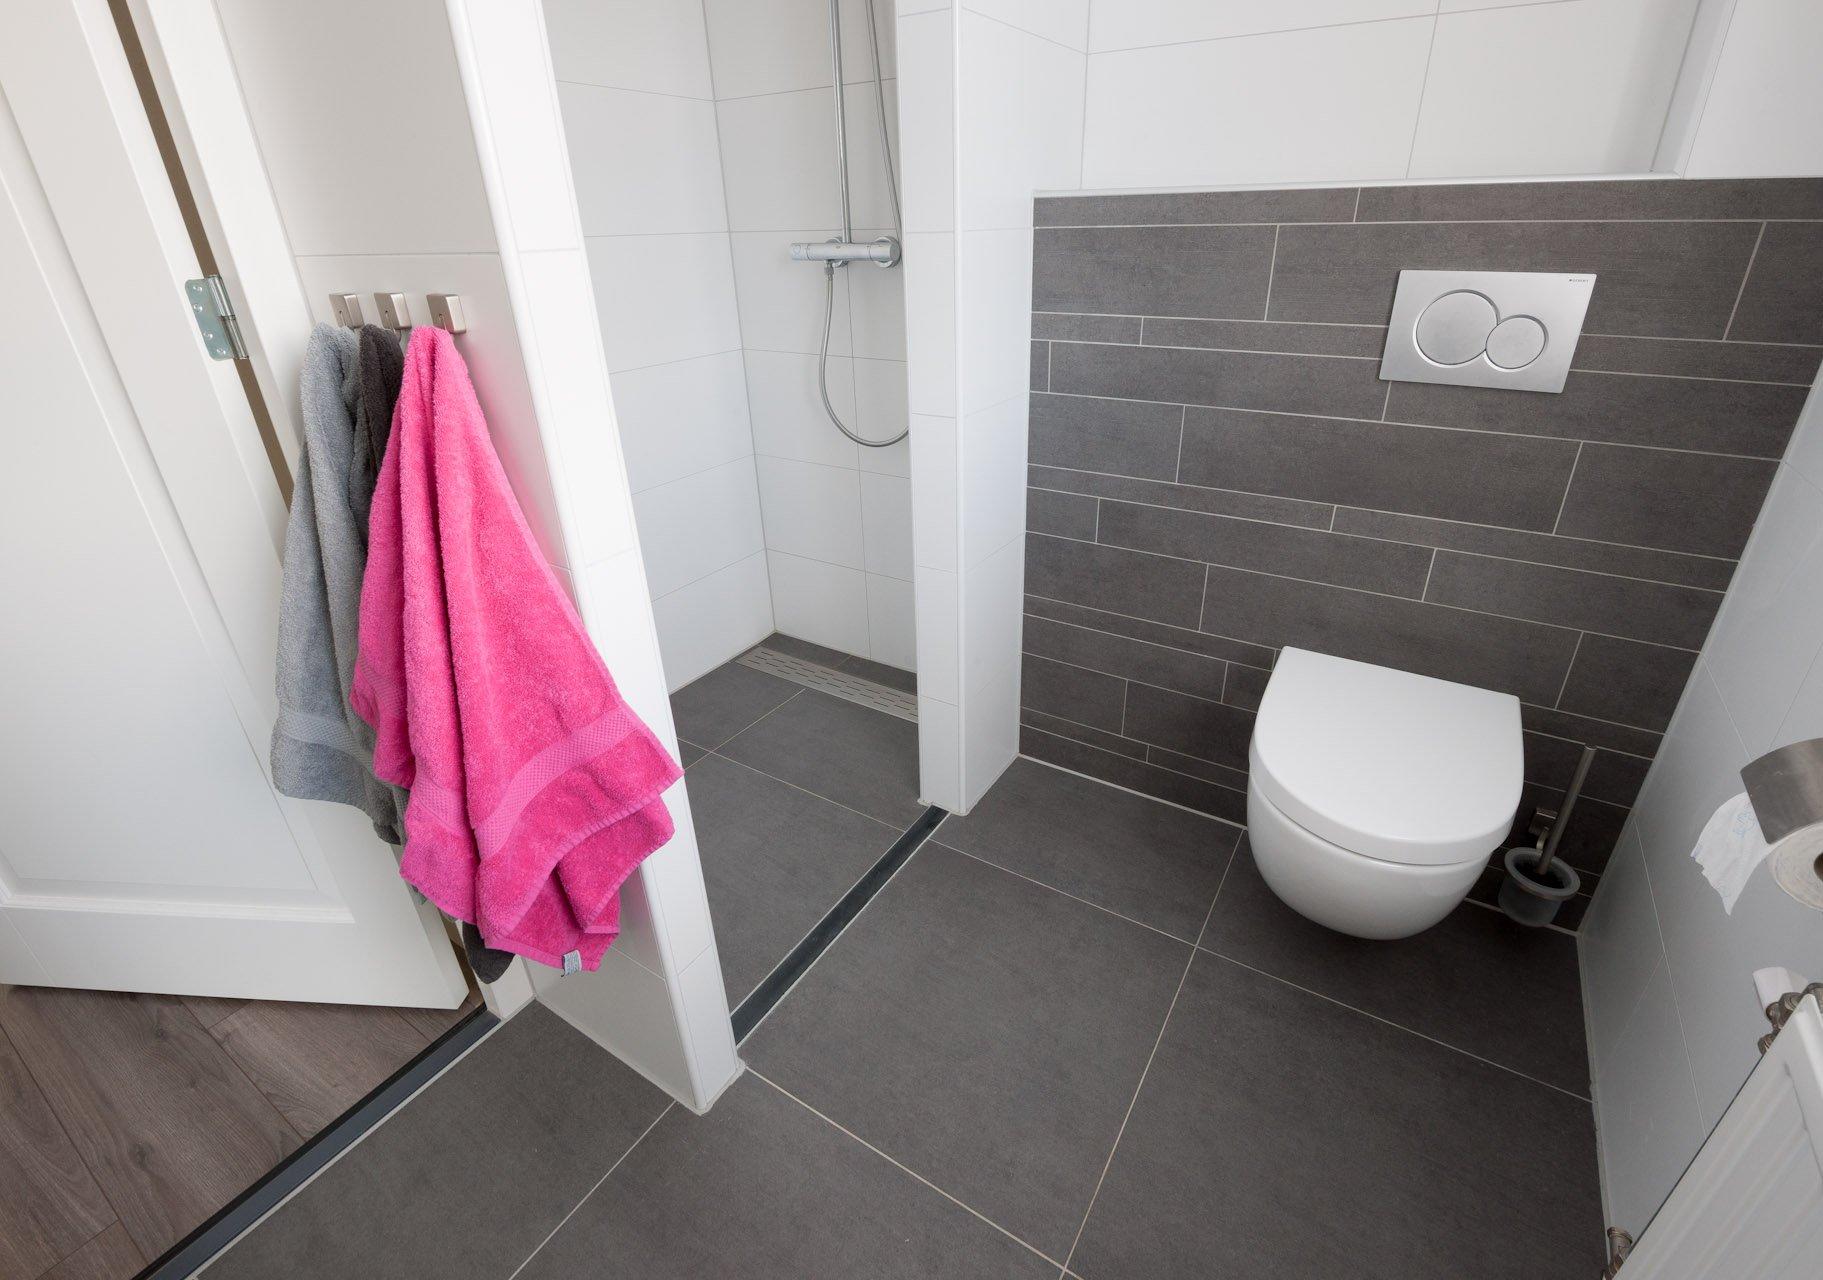 Luxe keuken ontwerp - Tegel patroon badkamer ...